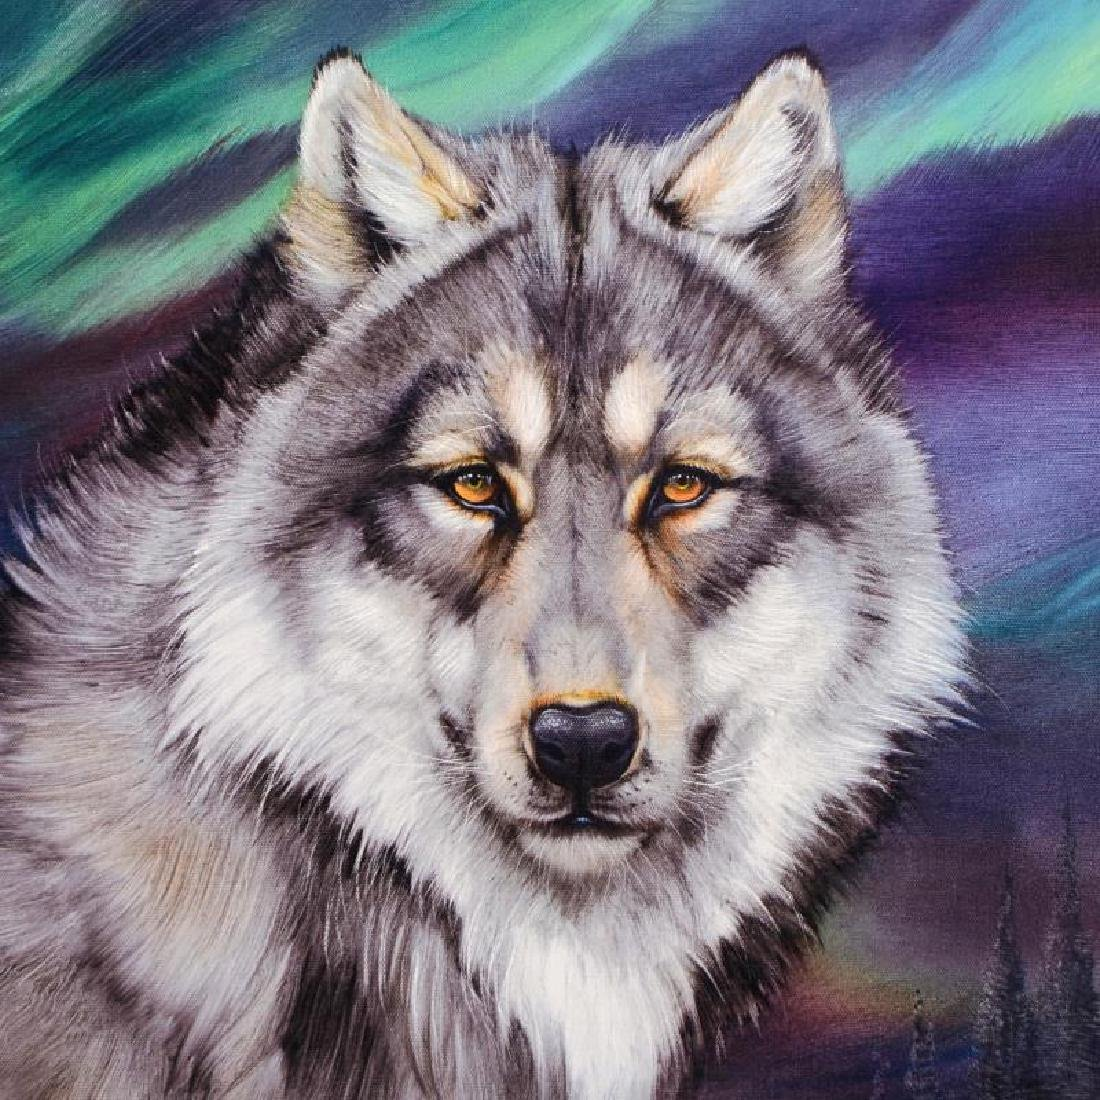 Wolf Lights II by Katon, Martin - 2